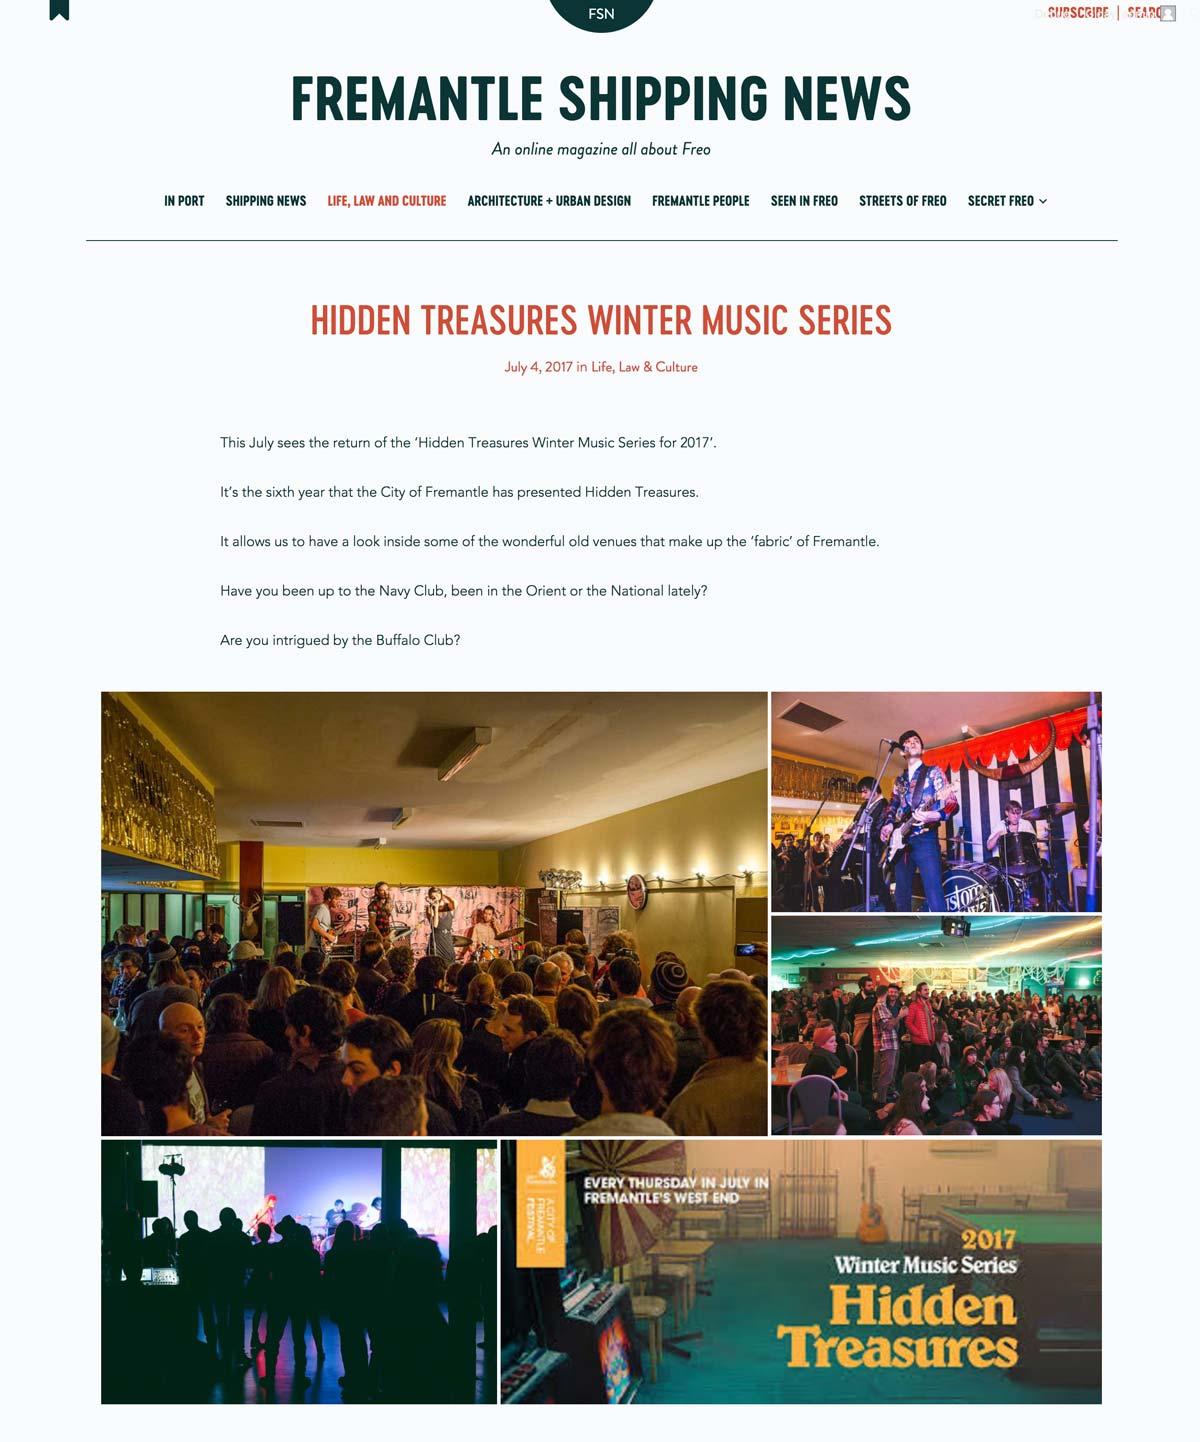 fremantleshippingnews.com.au-2017-07-04-hidden-treasures-winter-music-series-